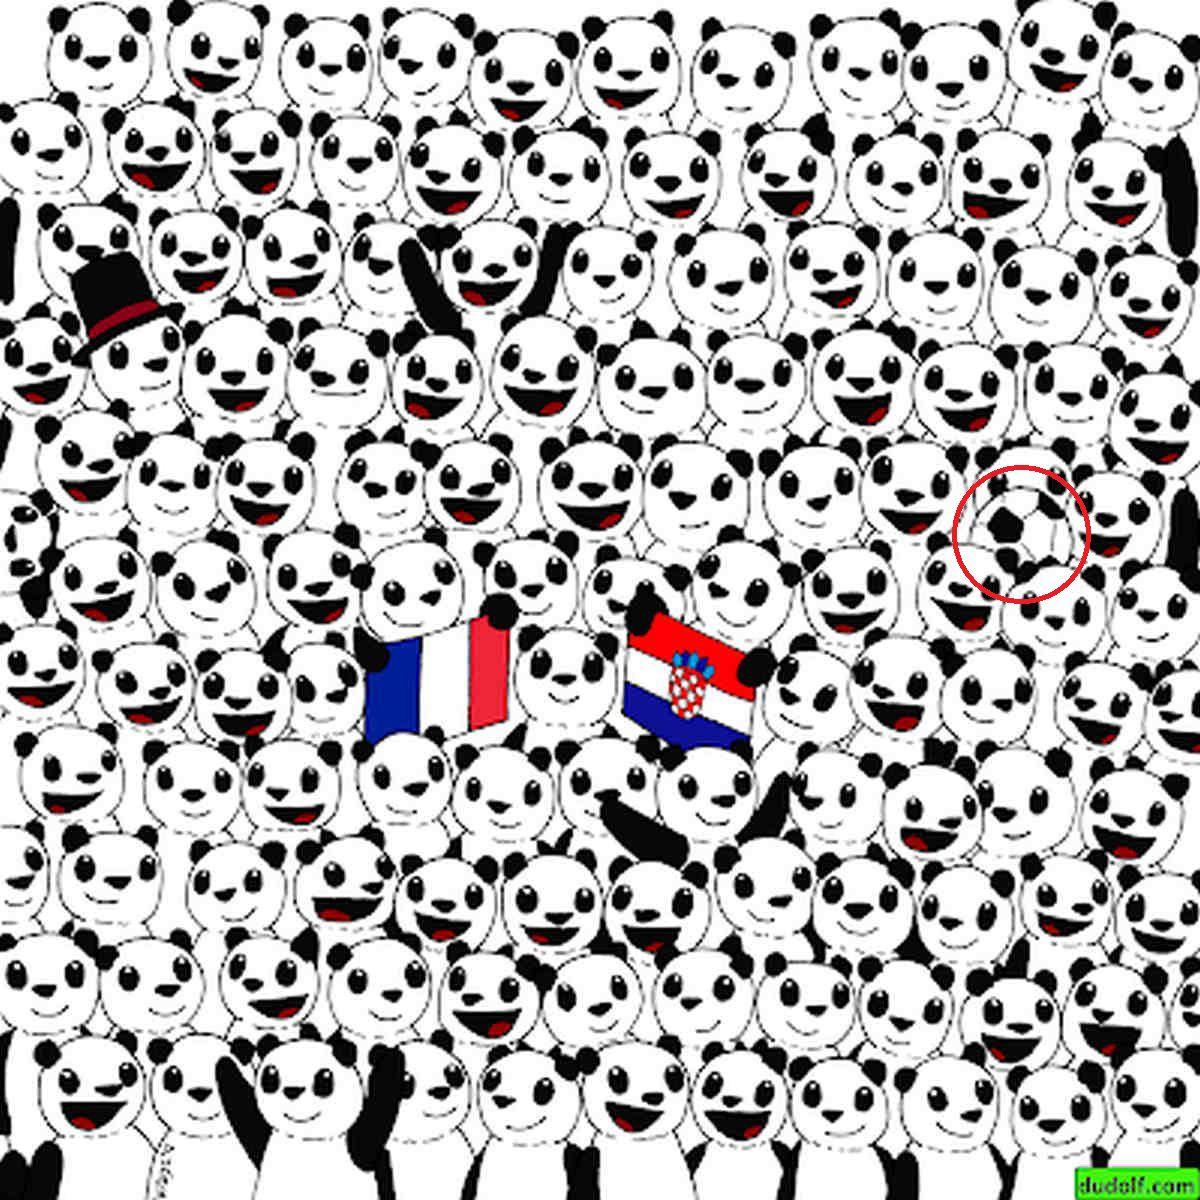 Casi nadie halló la pelota de fútbol entre los pandas. (Foto: dudolf.com)